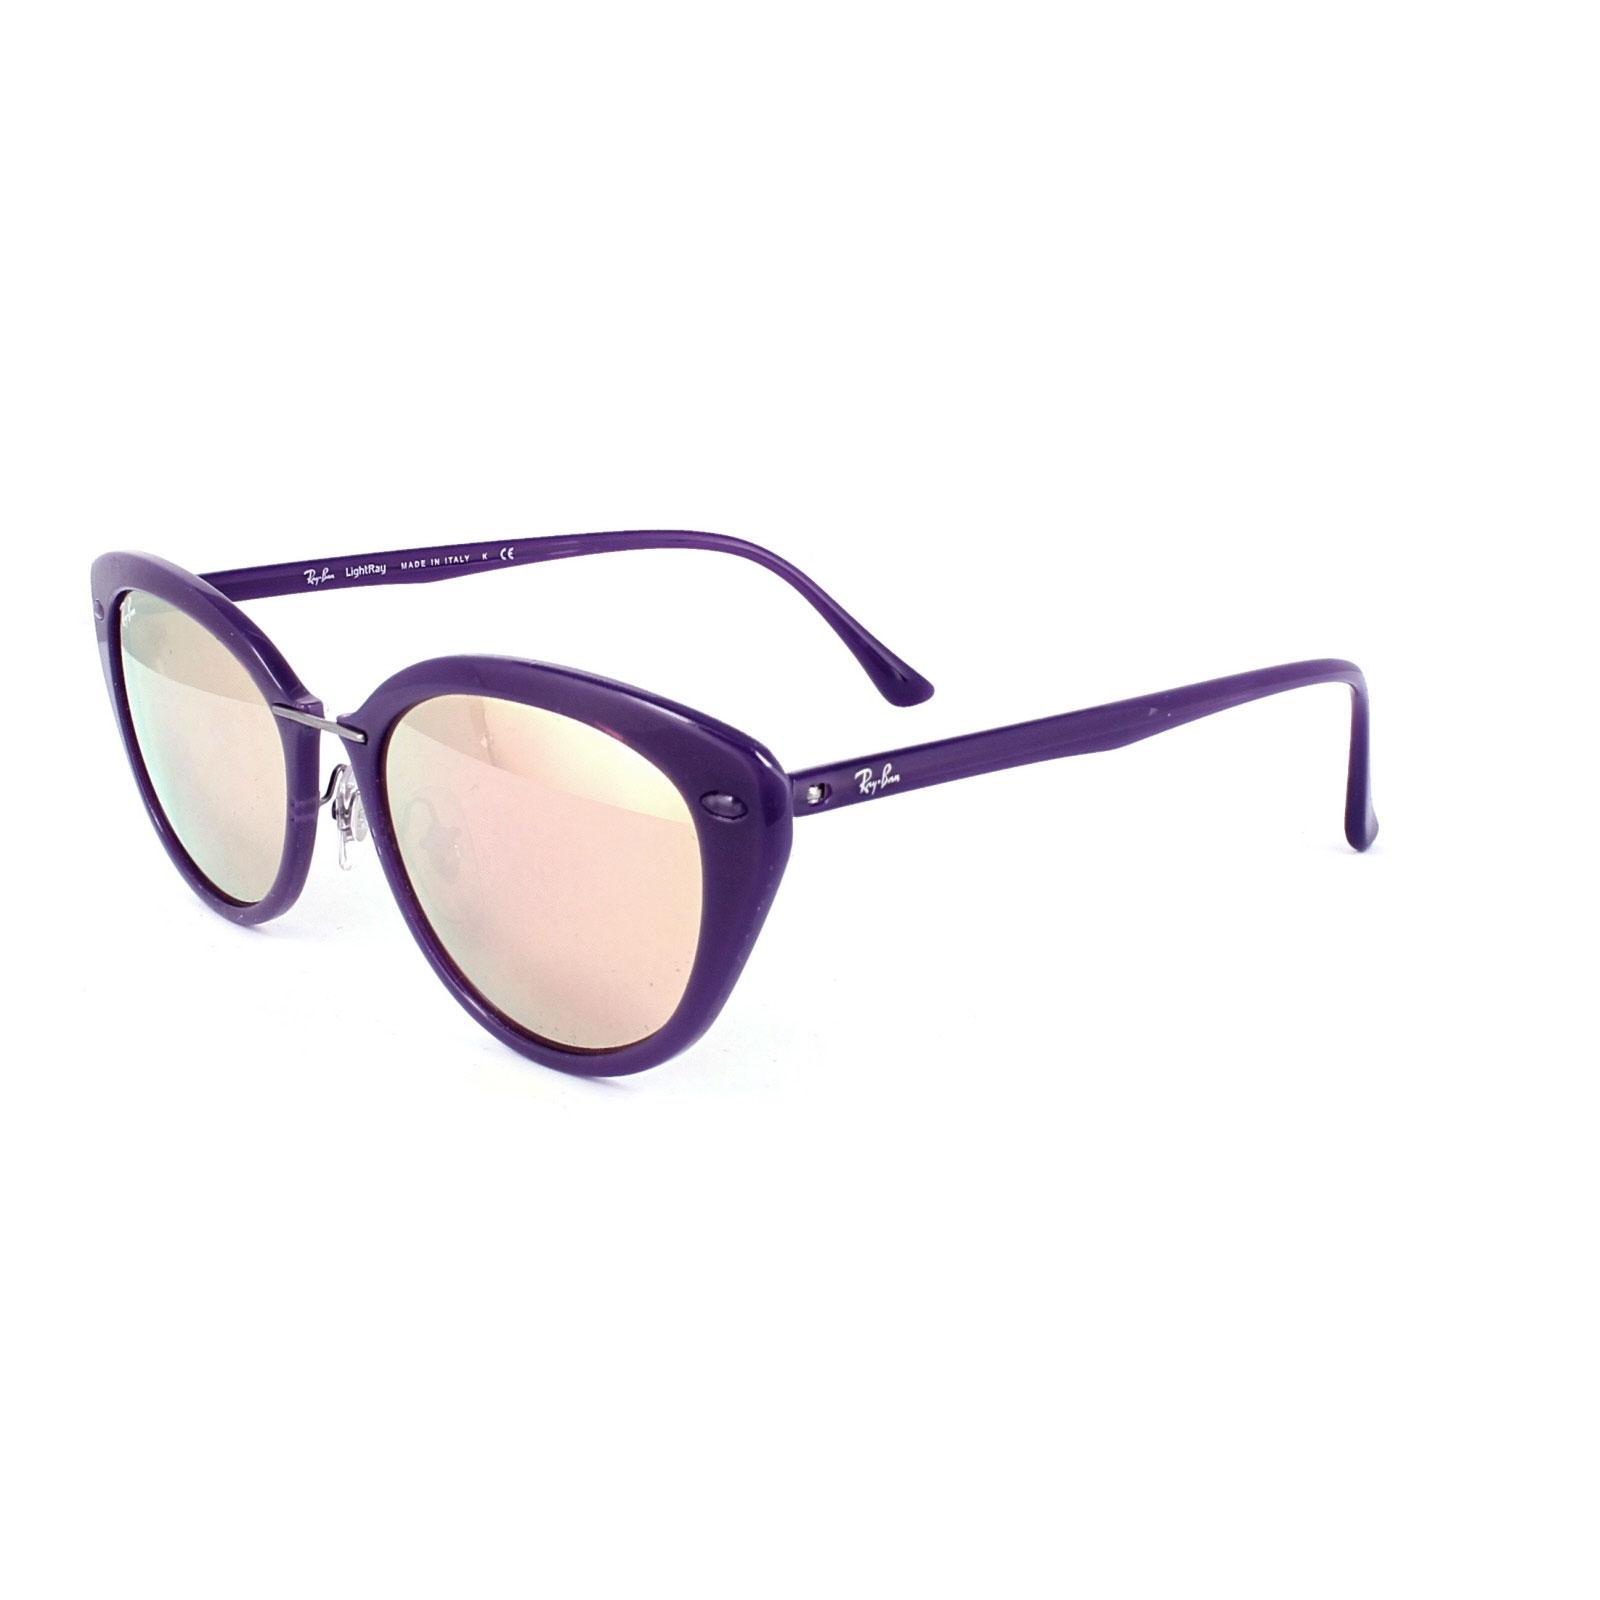 d4577aff91 Ray-Ban Sunglasses 4250 60342Y Violet Copper Mirror 8053672573398